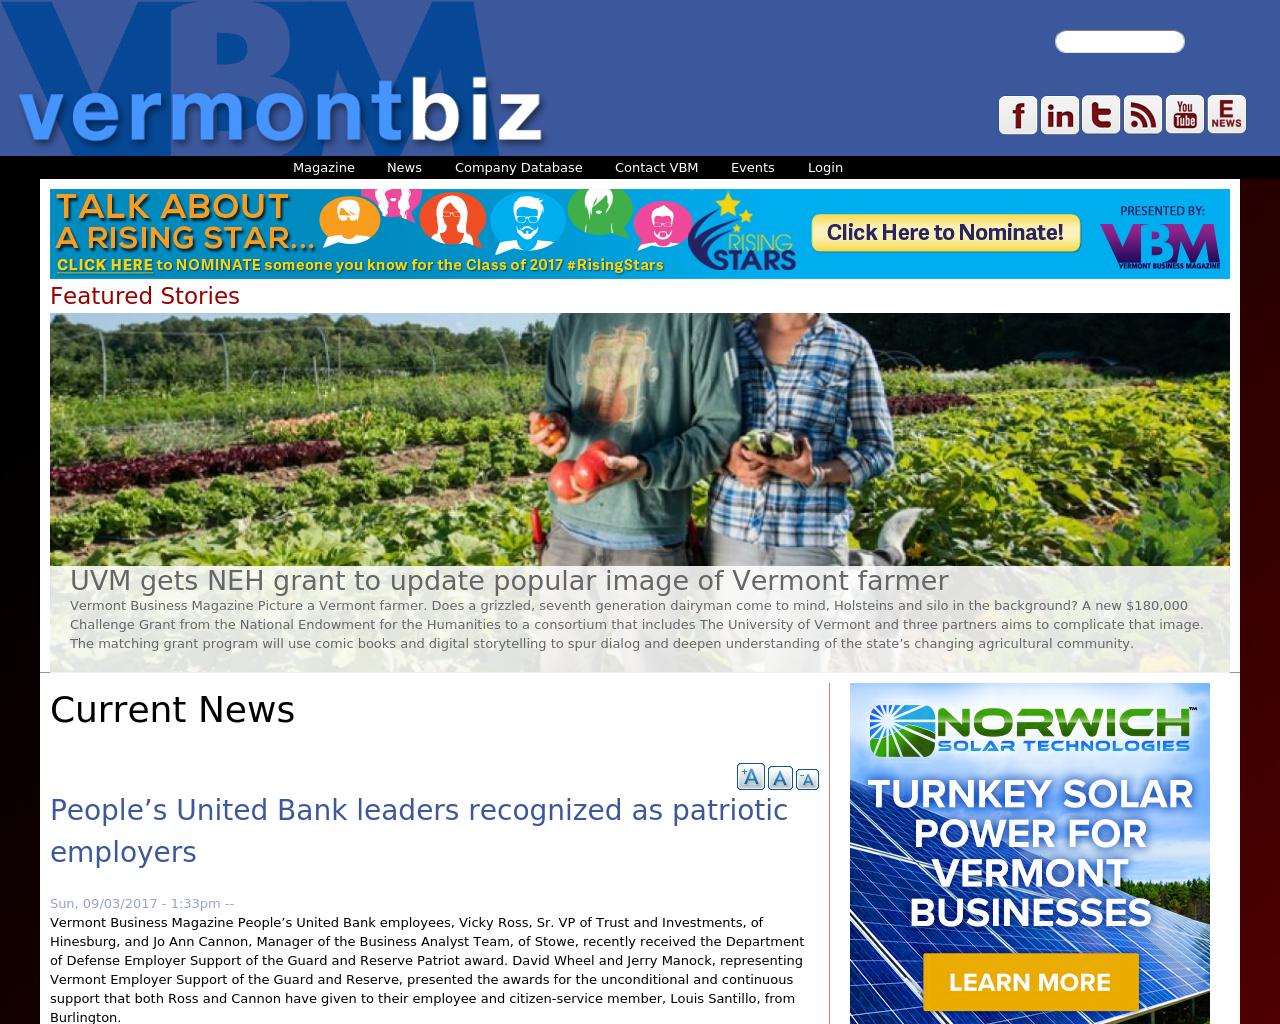 Vermontbiz-Advertising-Reviews-Pricing